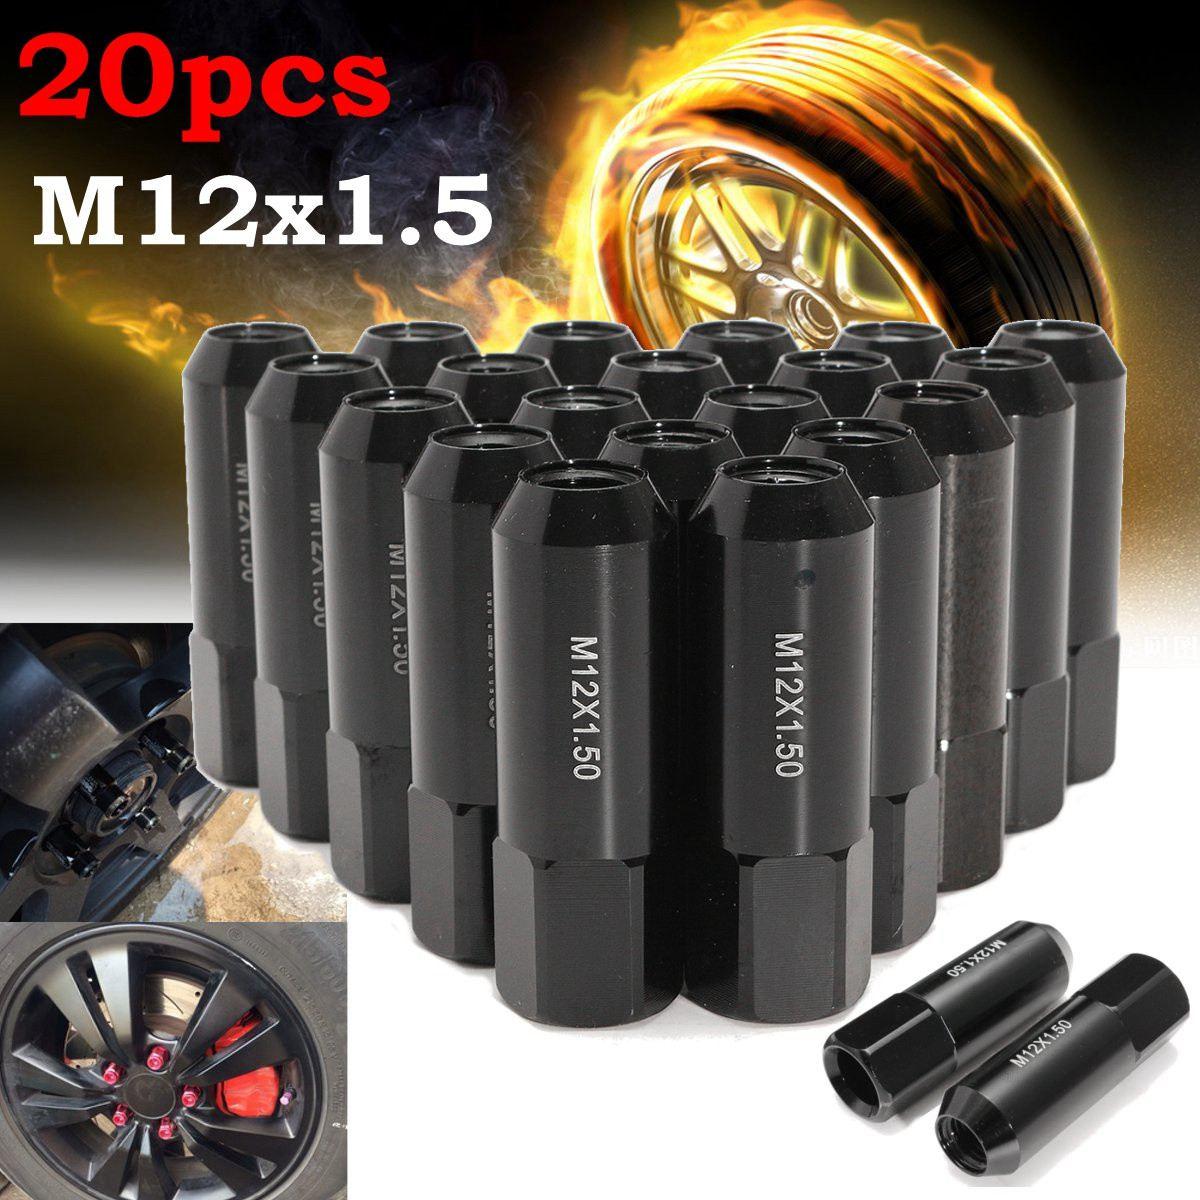 20pcs M12X1.5 50mm Car Extended Forged Aluminum Tuner Racing Wheel Lug Nut Black